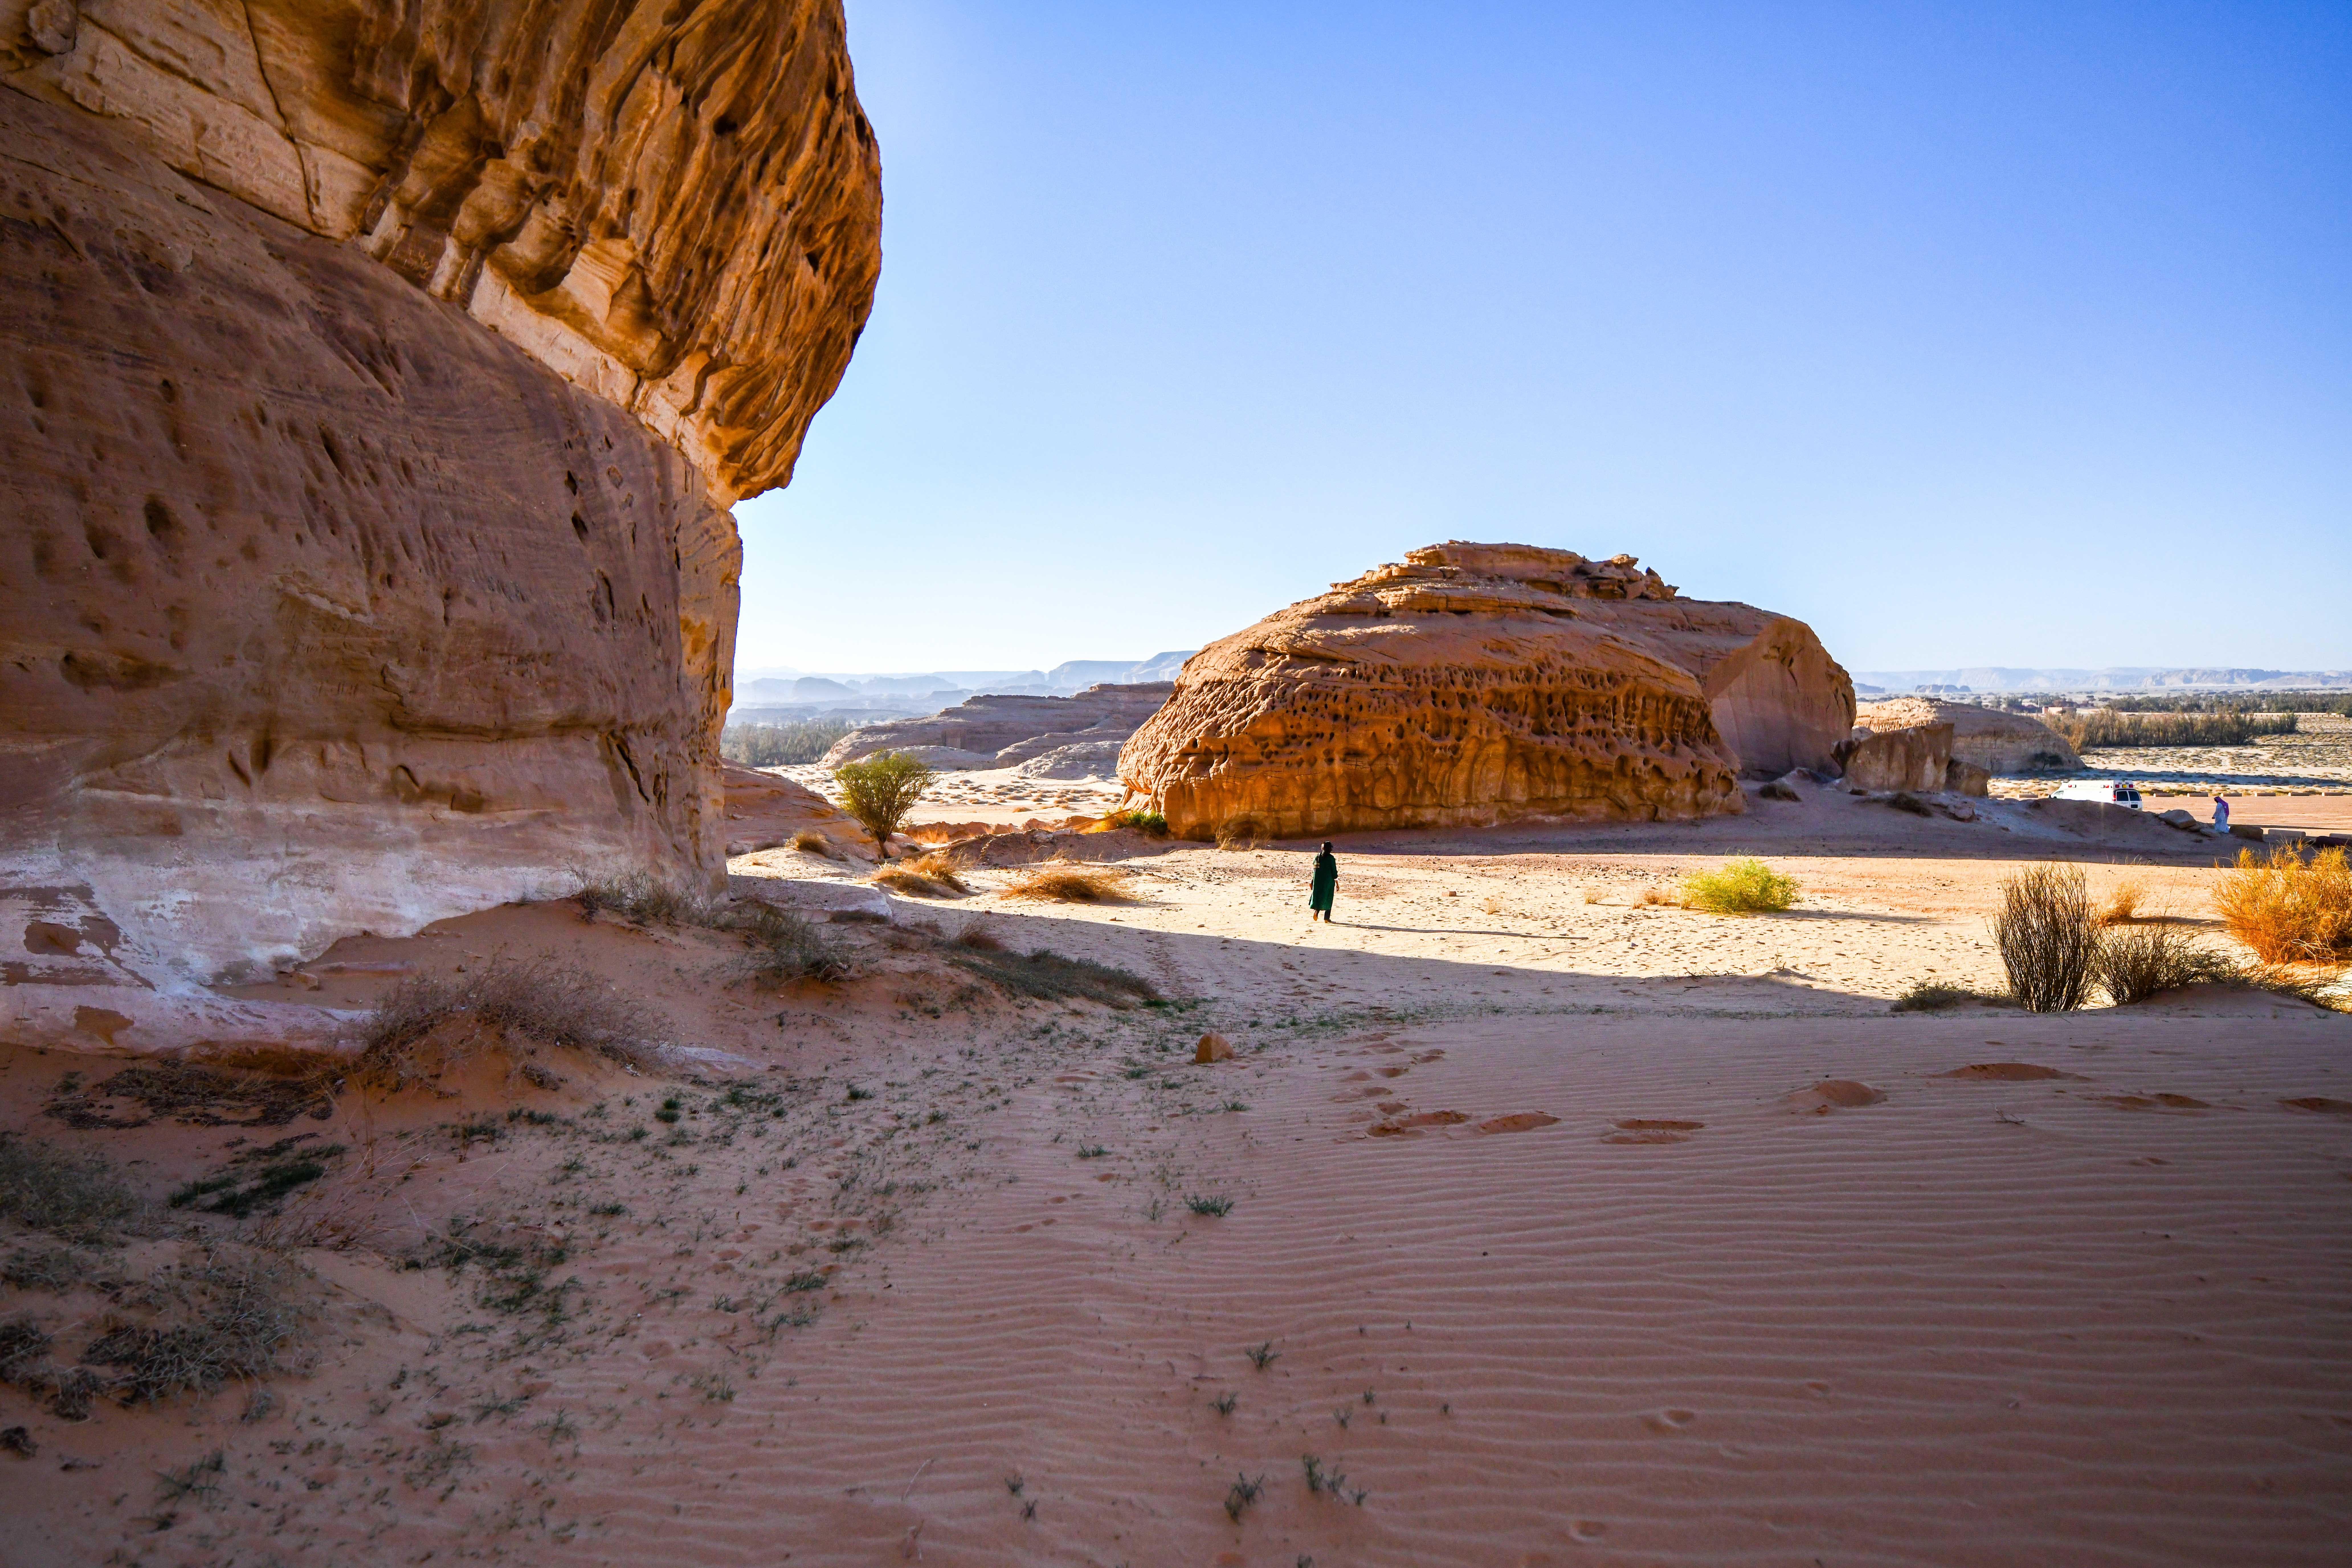 My Trip to Saudi Arabia: Part Two of Three